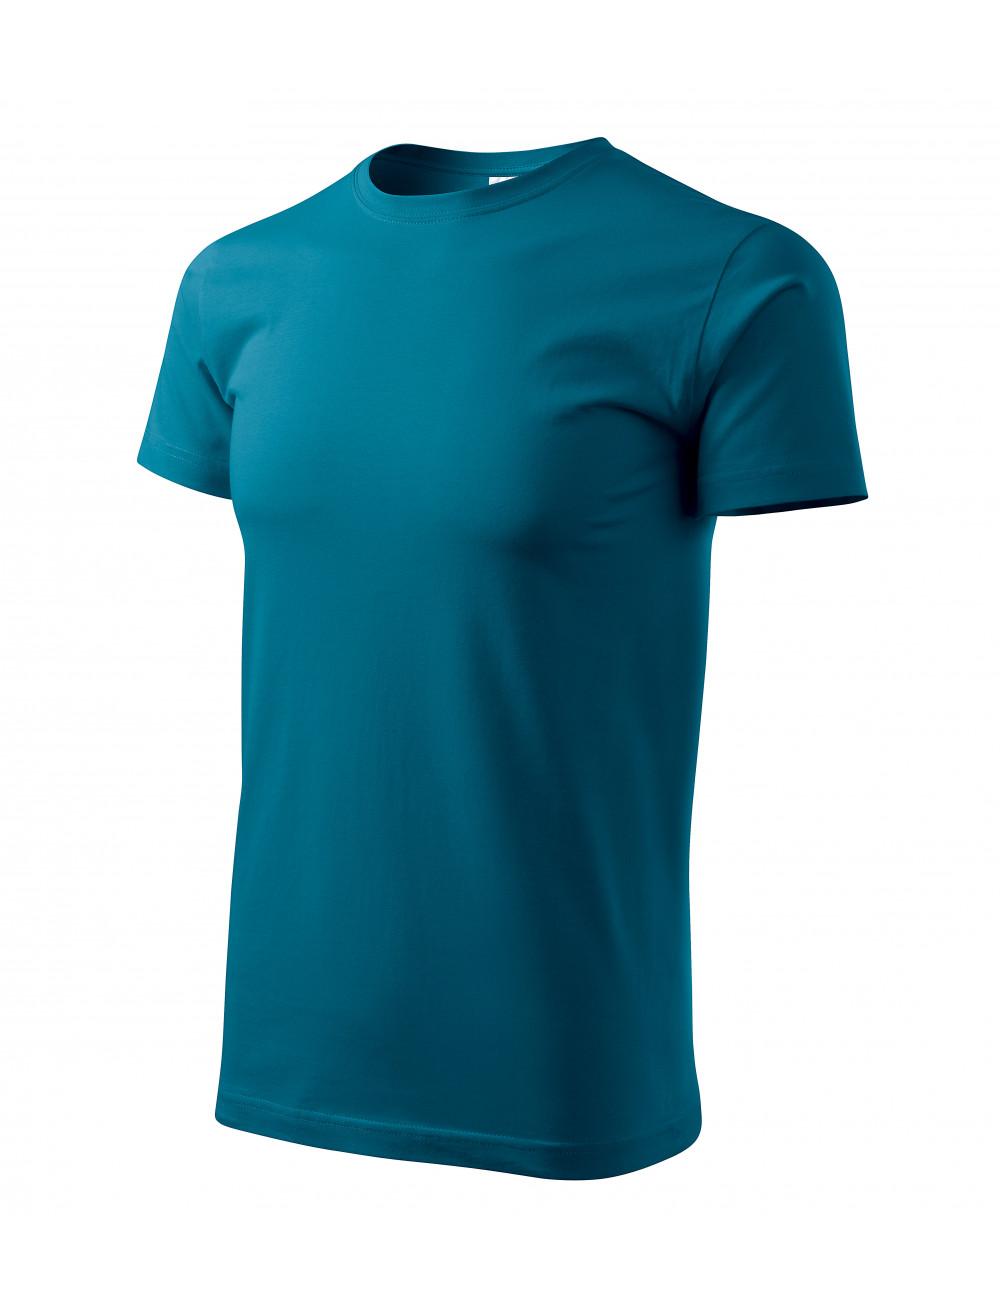 Adler MALFINI Koszulka unisex Heavy New 137 petrol blue